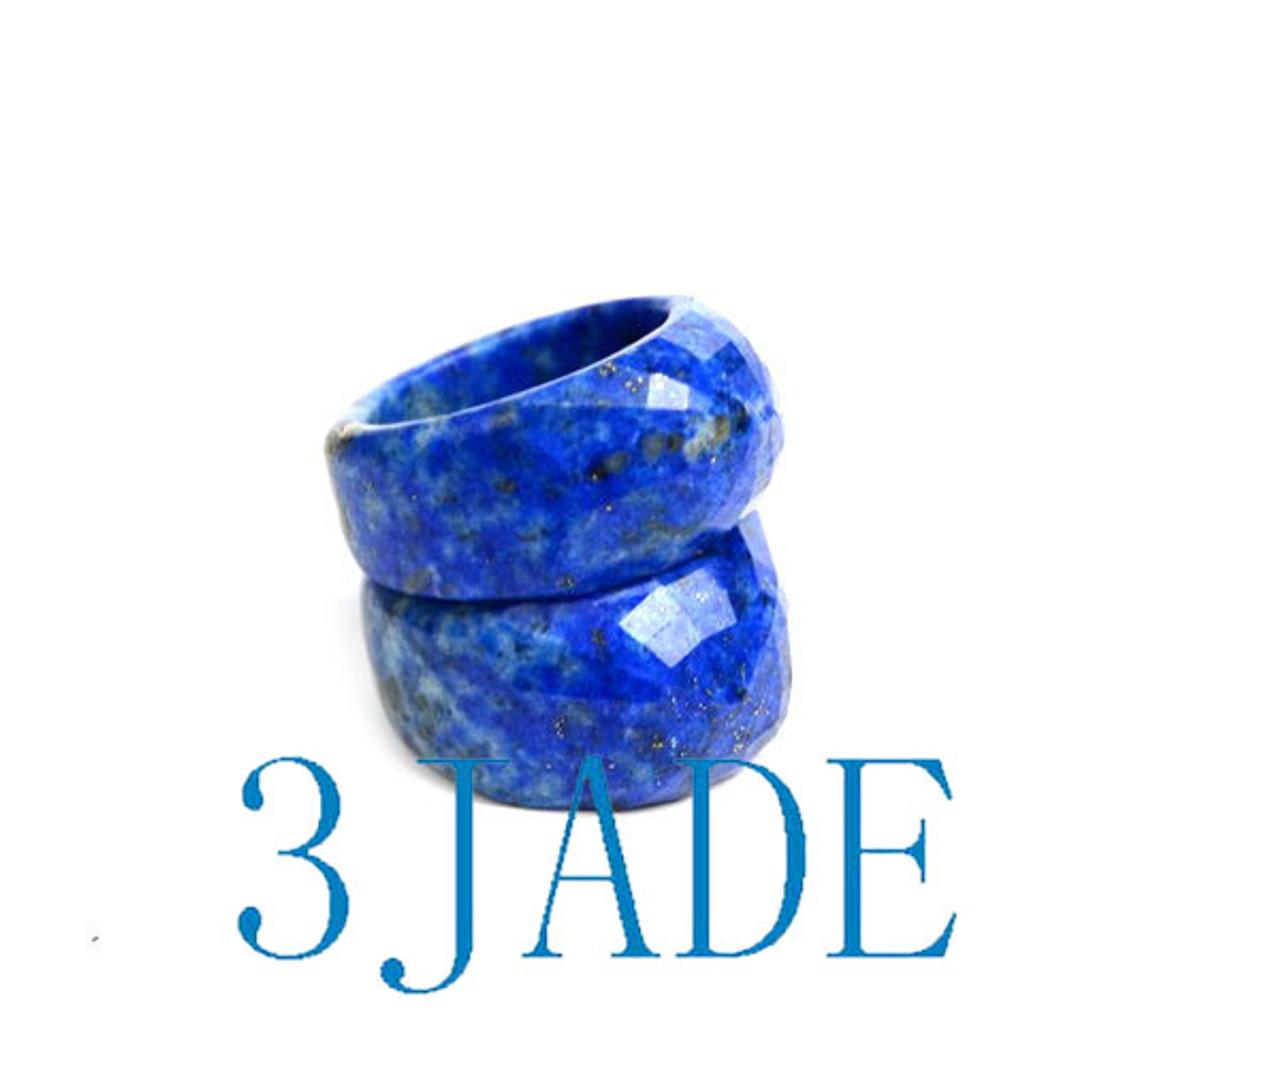 Faceted Lapis Lazuli Ring